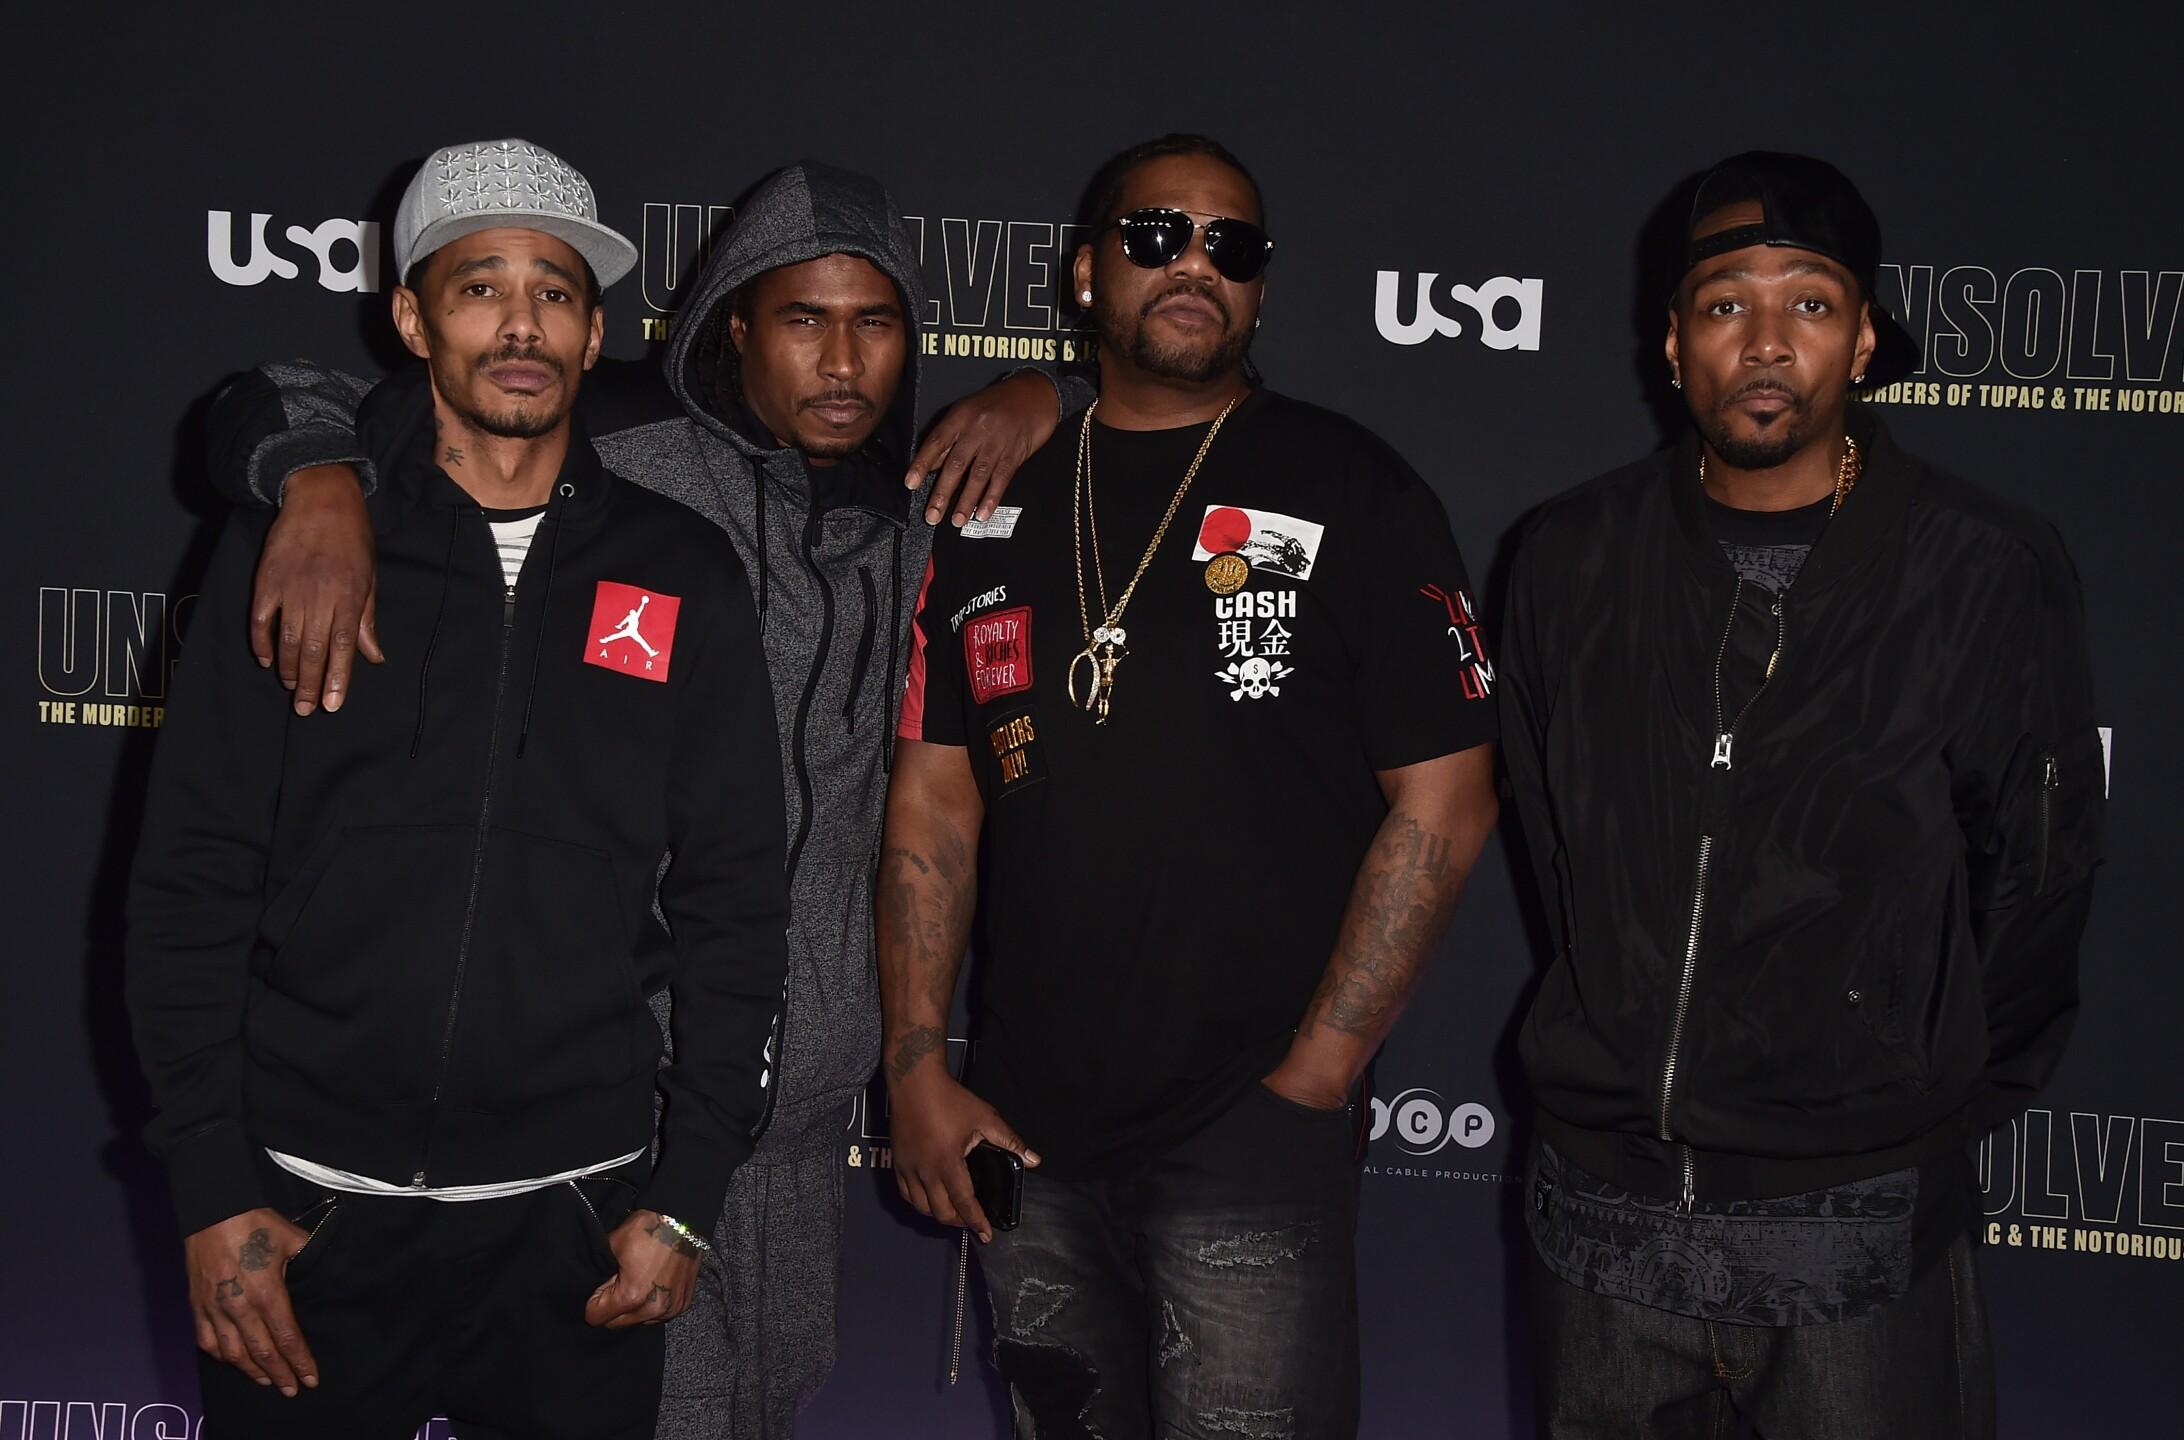 Bone Thugs-N-Harmony to perform at Summerfest 2019.